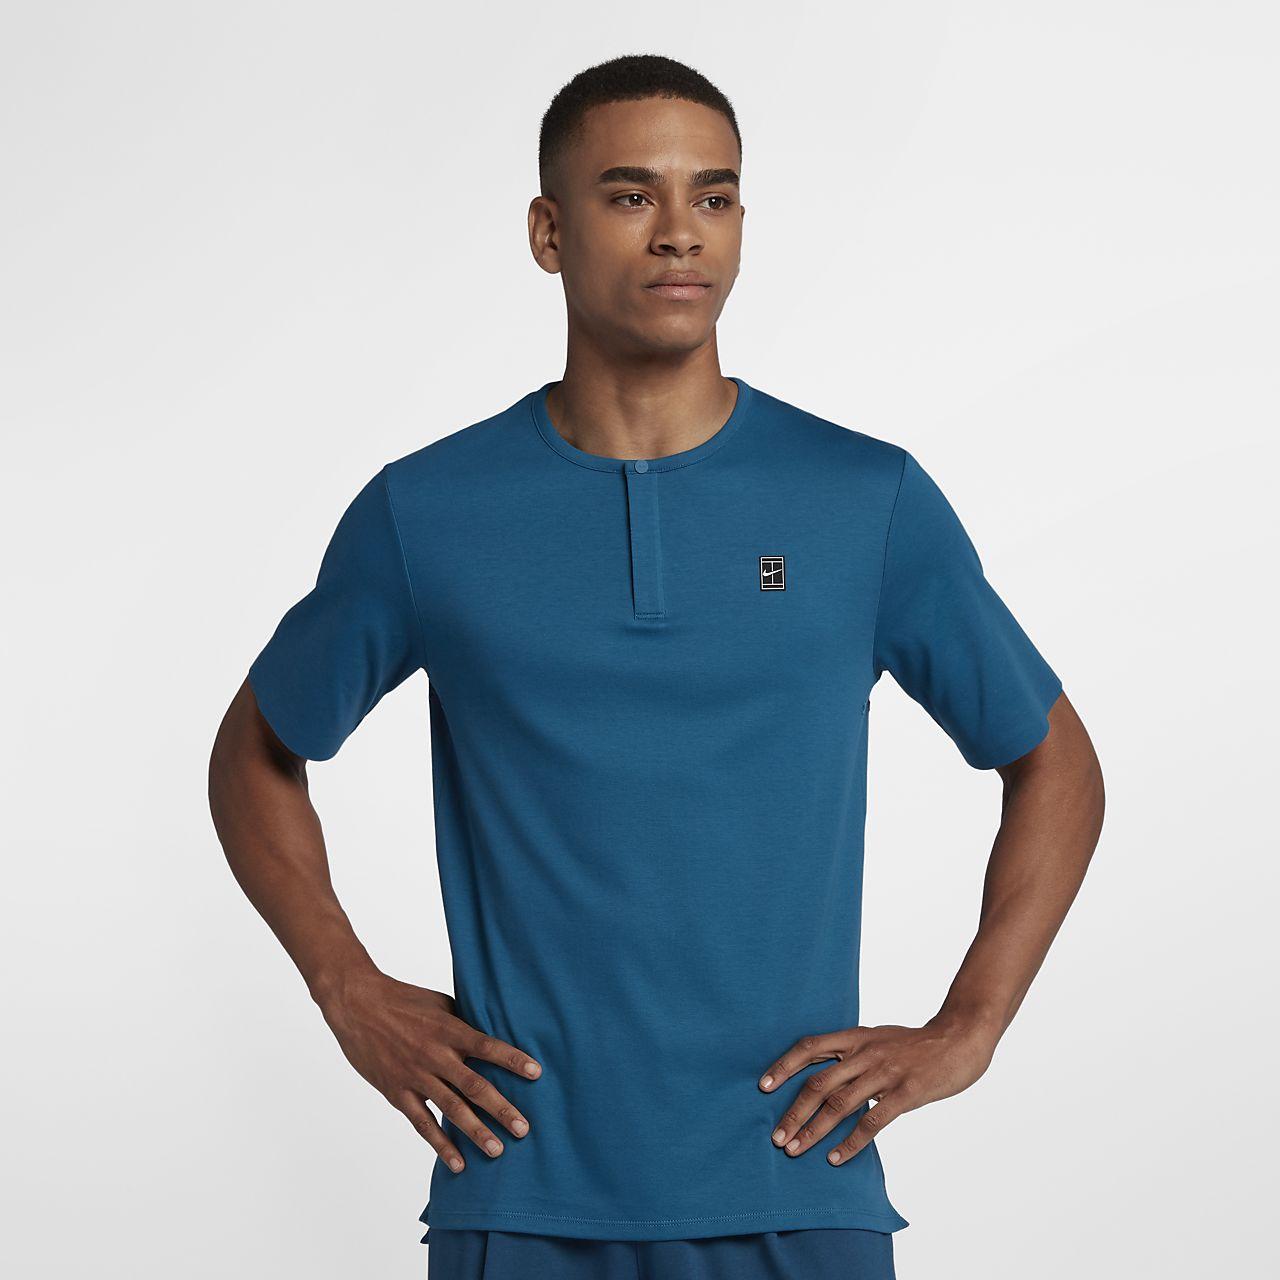 5e8adc307e72 Pánské tenisové tričko s krátkým rukávem NikeCourt. Nike.com CZ